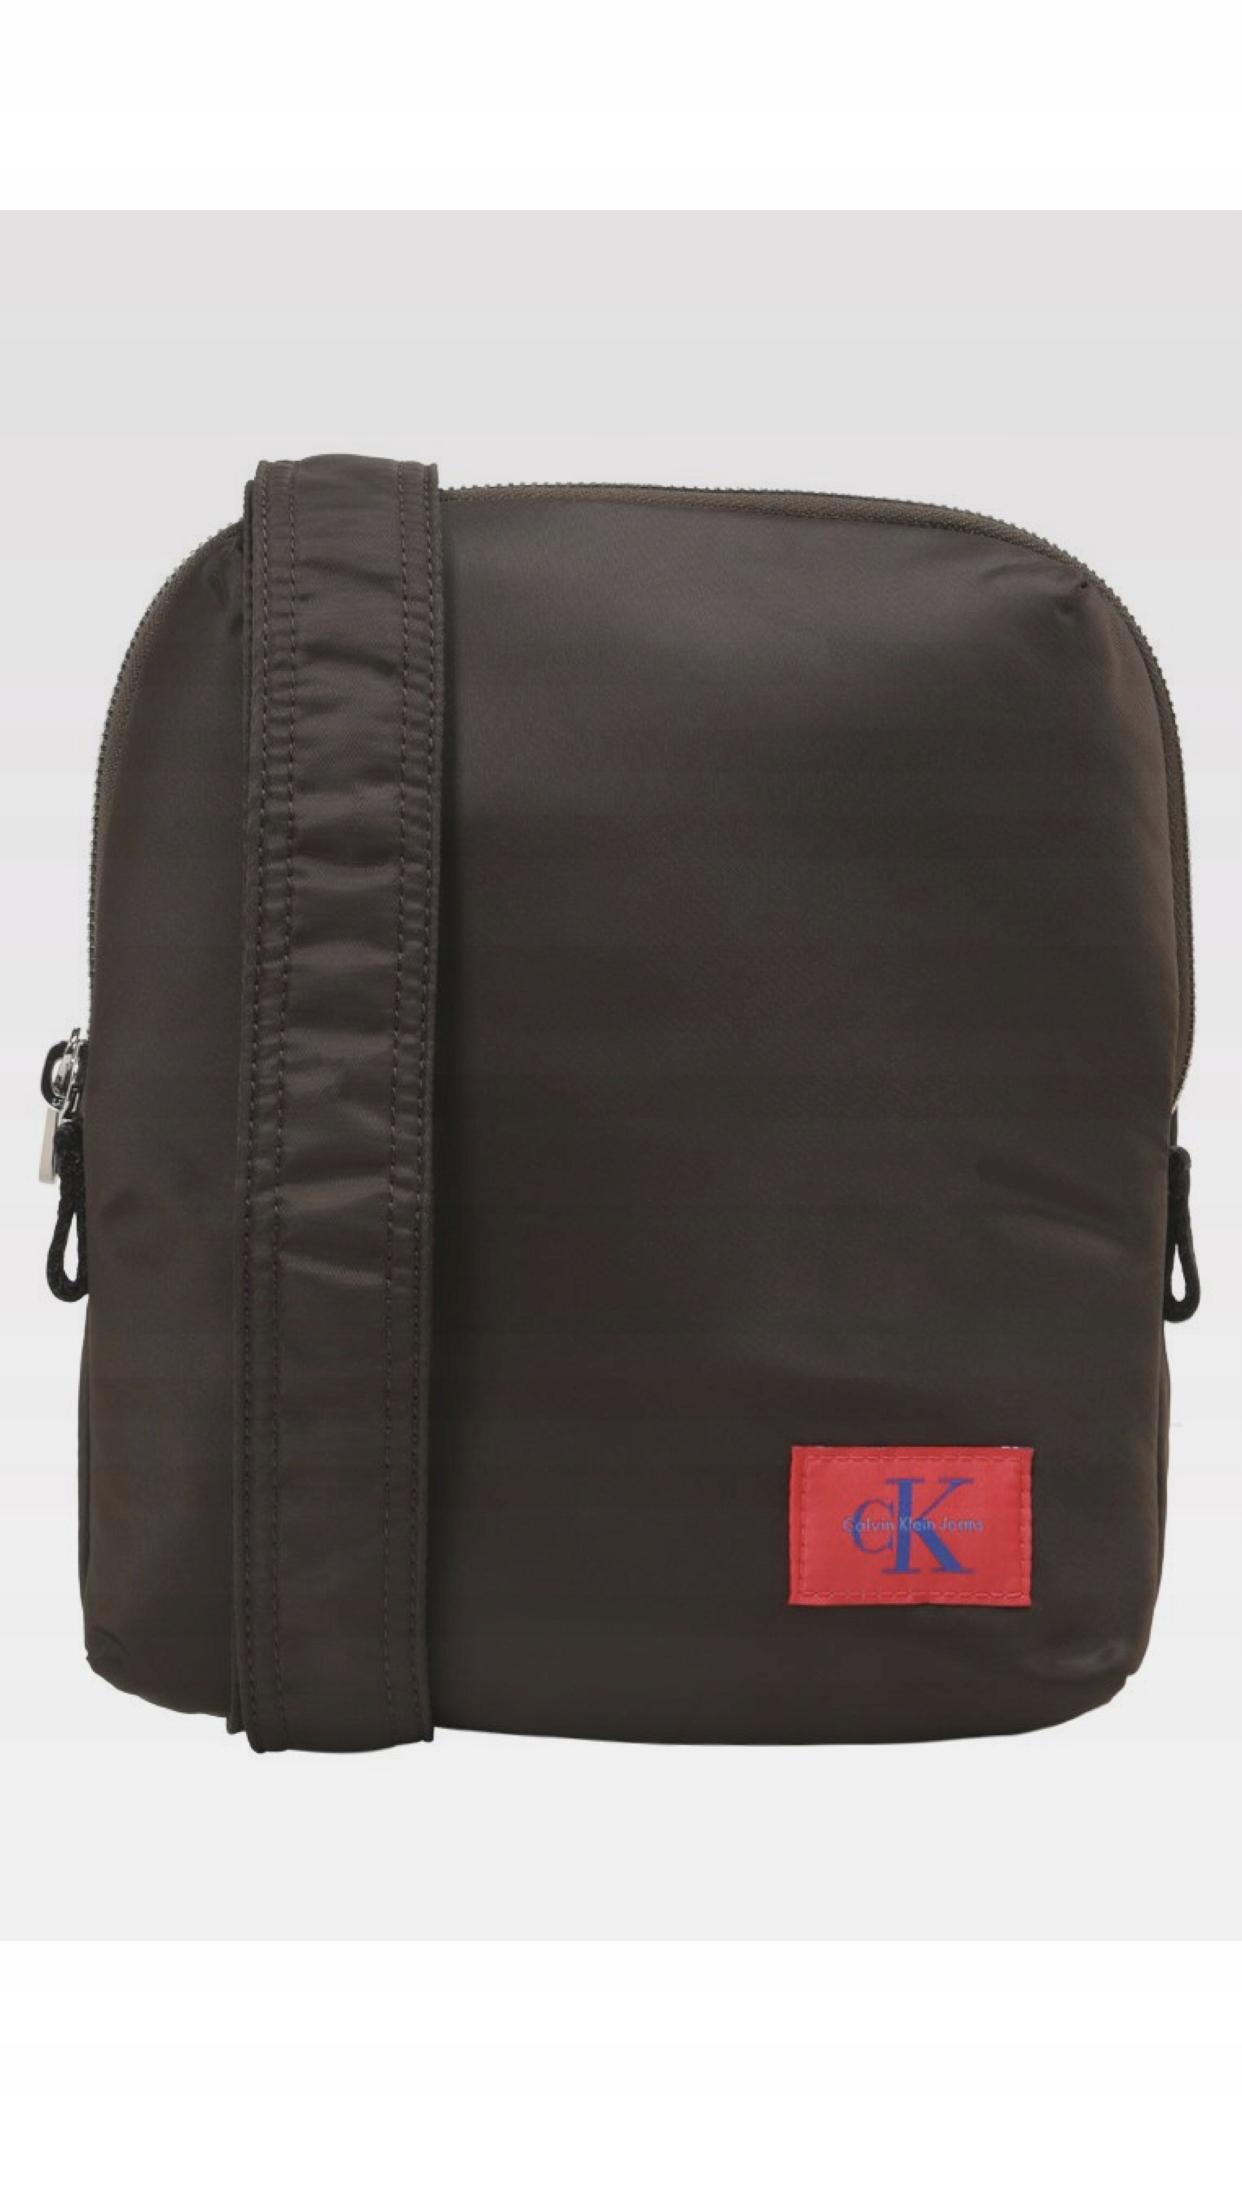 4c96a9b153a1b Calvin Klein Jeans PILOT FLAT PACK Torba na ramie - 7548848997 ...